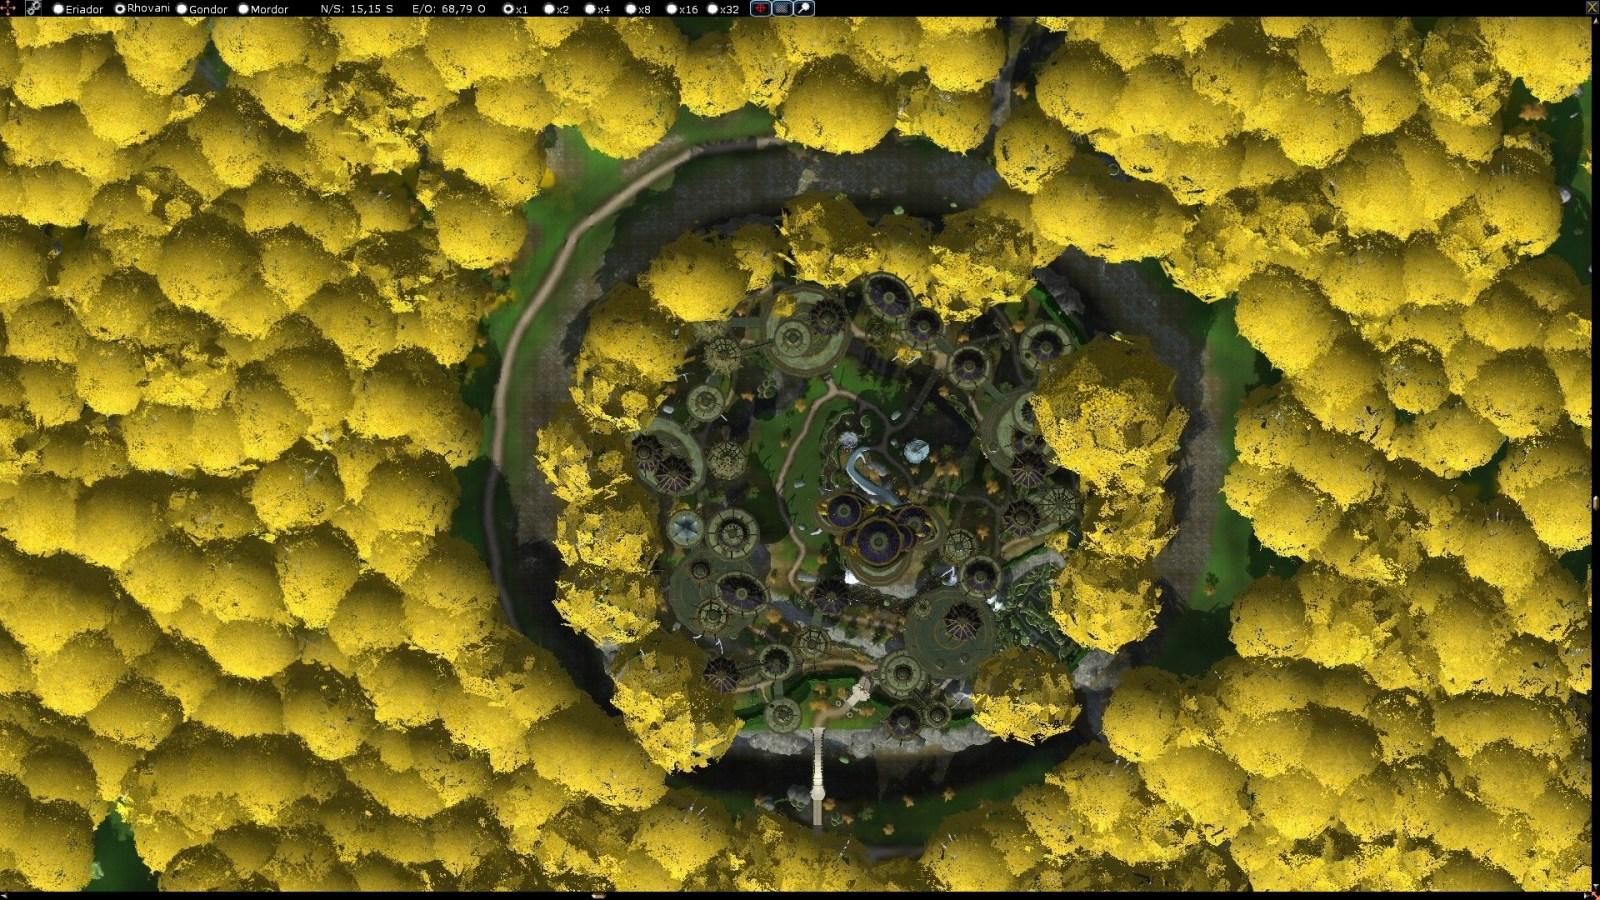 Le Plugin de l'Explorateur : TerrainMap